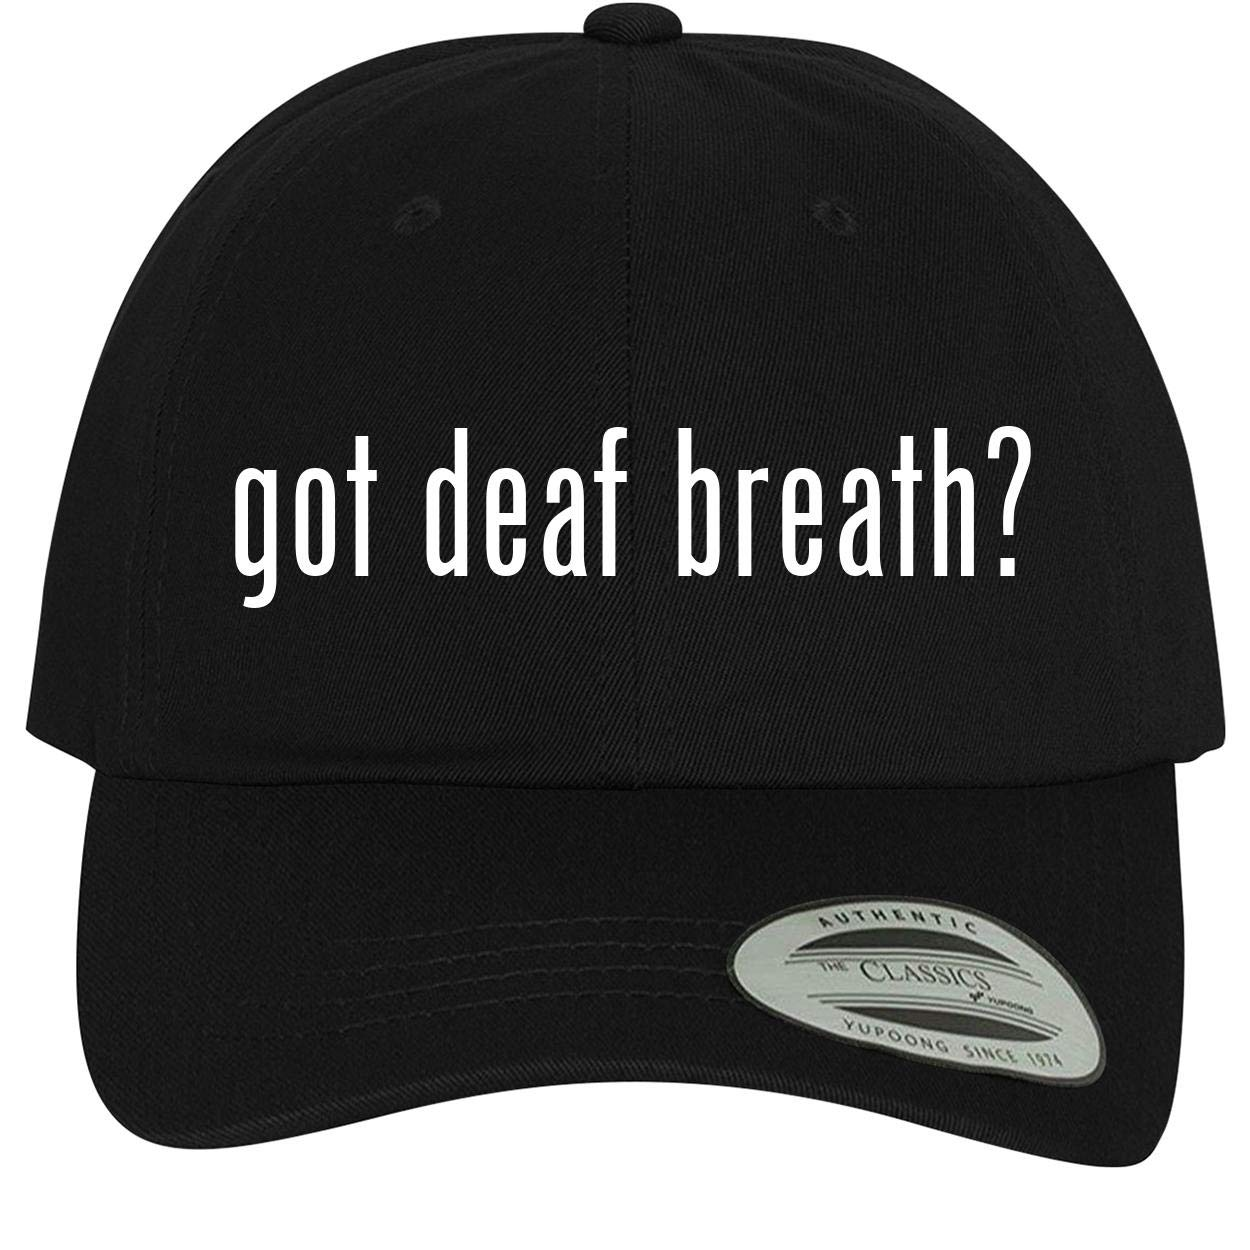 Comfortable Dad Hat Baseball Cap BH Cool Designs got Deaf Breath?